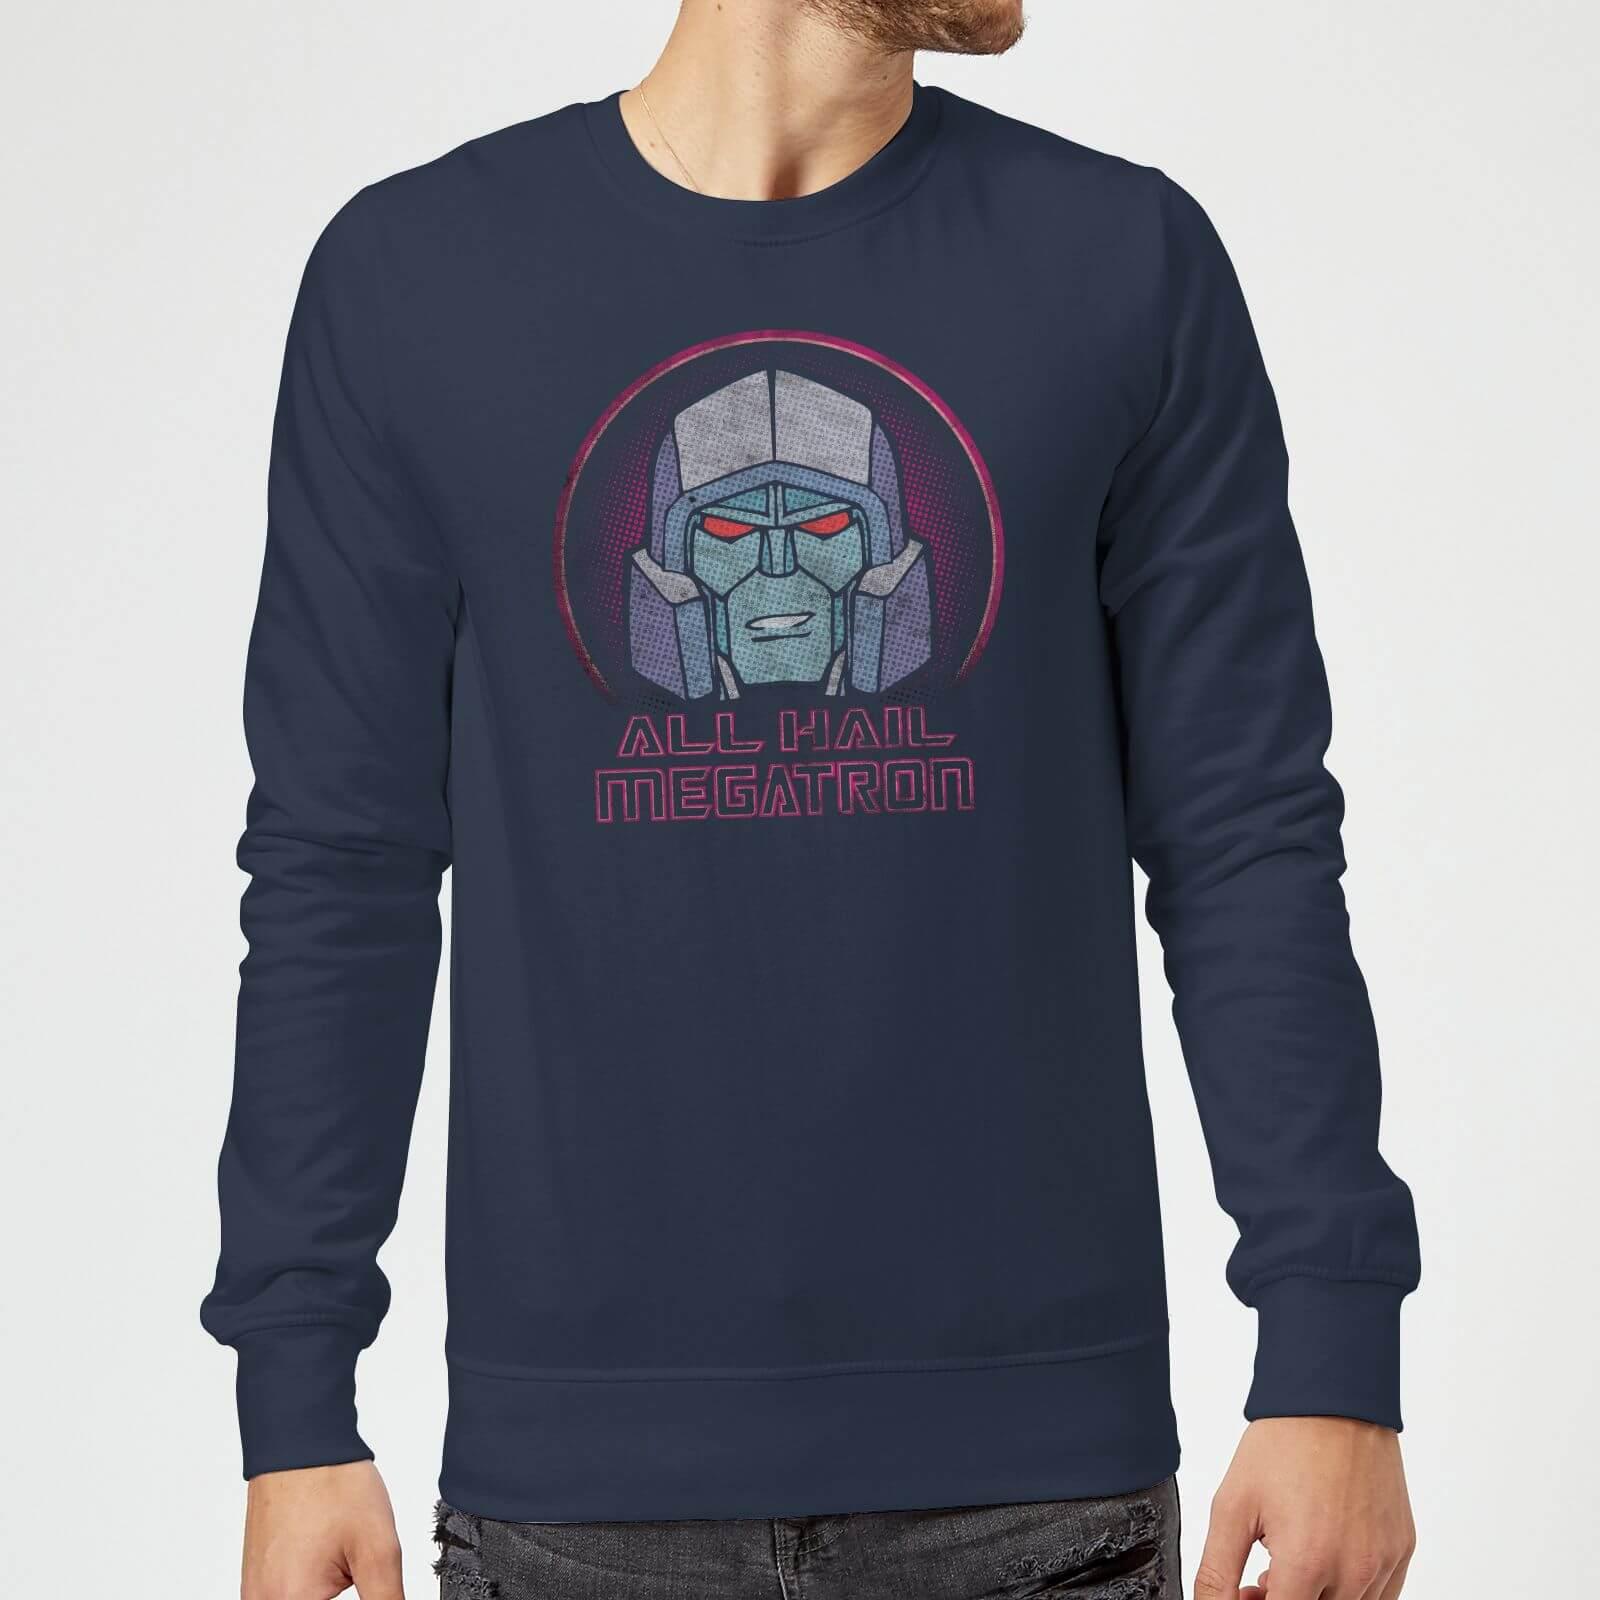 Transformers All Hail Megatron Sweatshirt   Navy   3XL   Navy